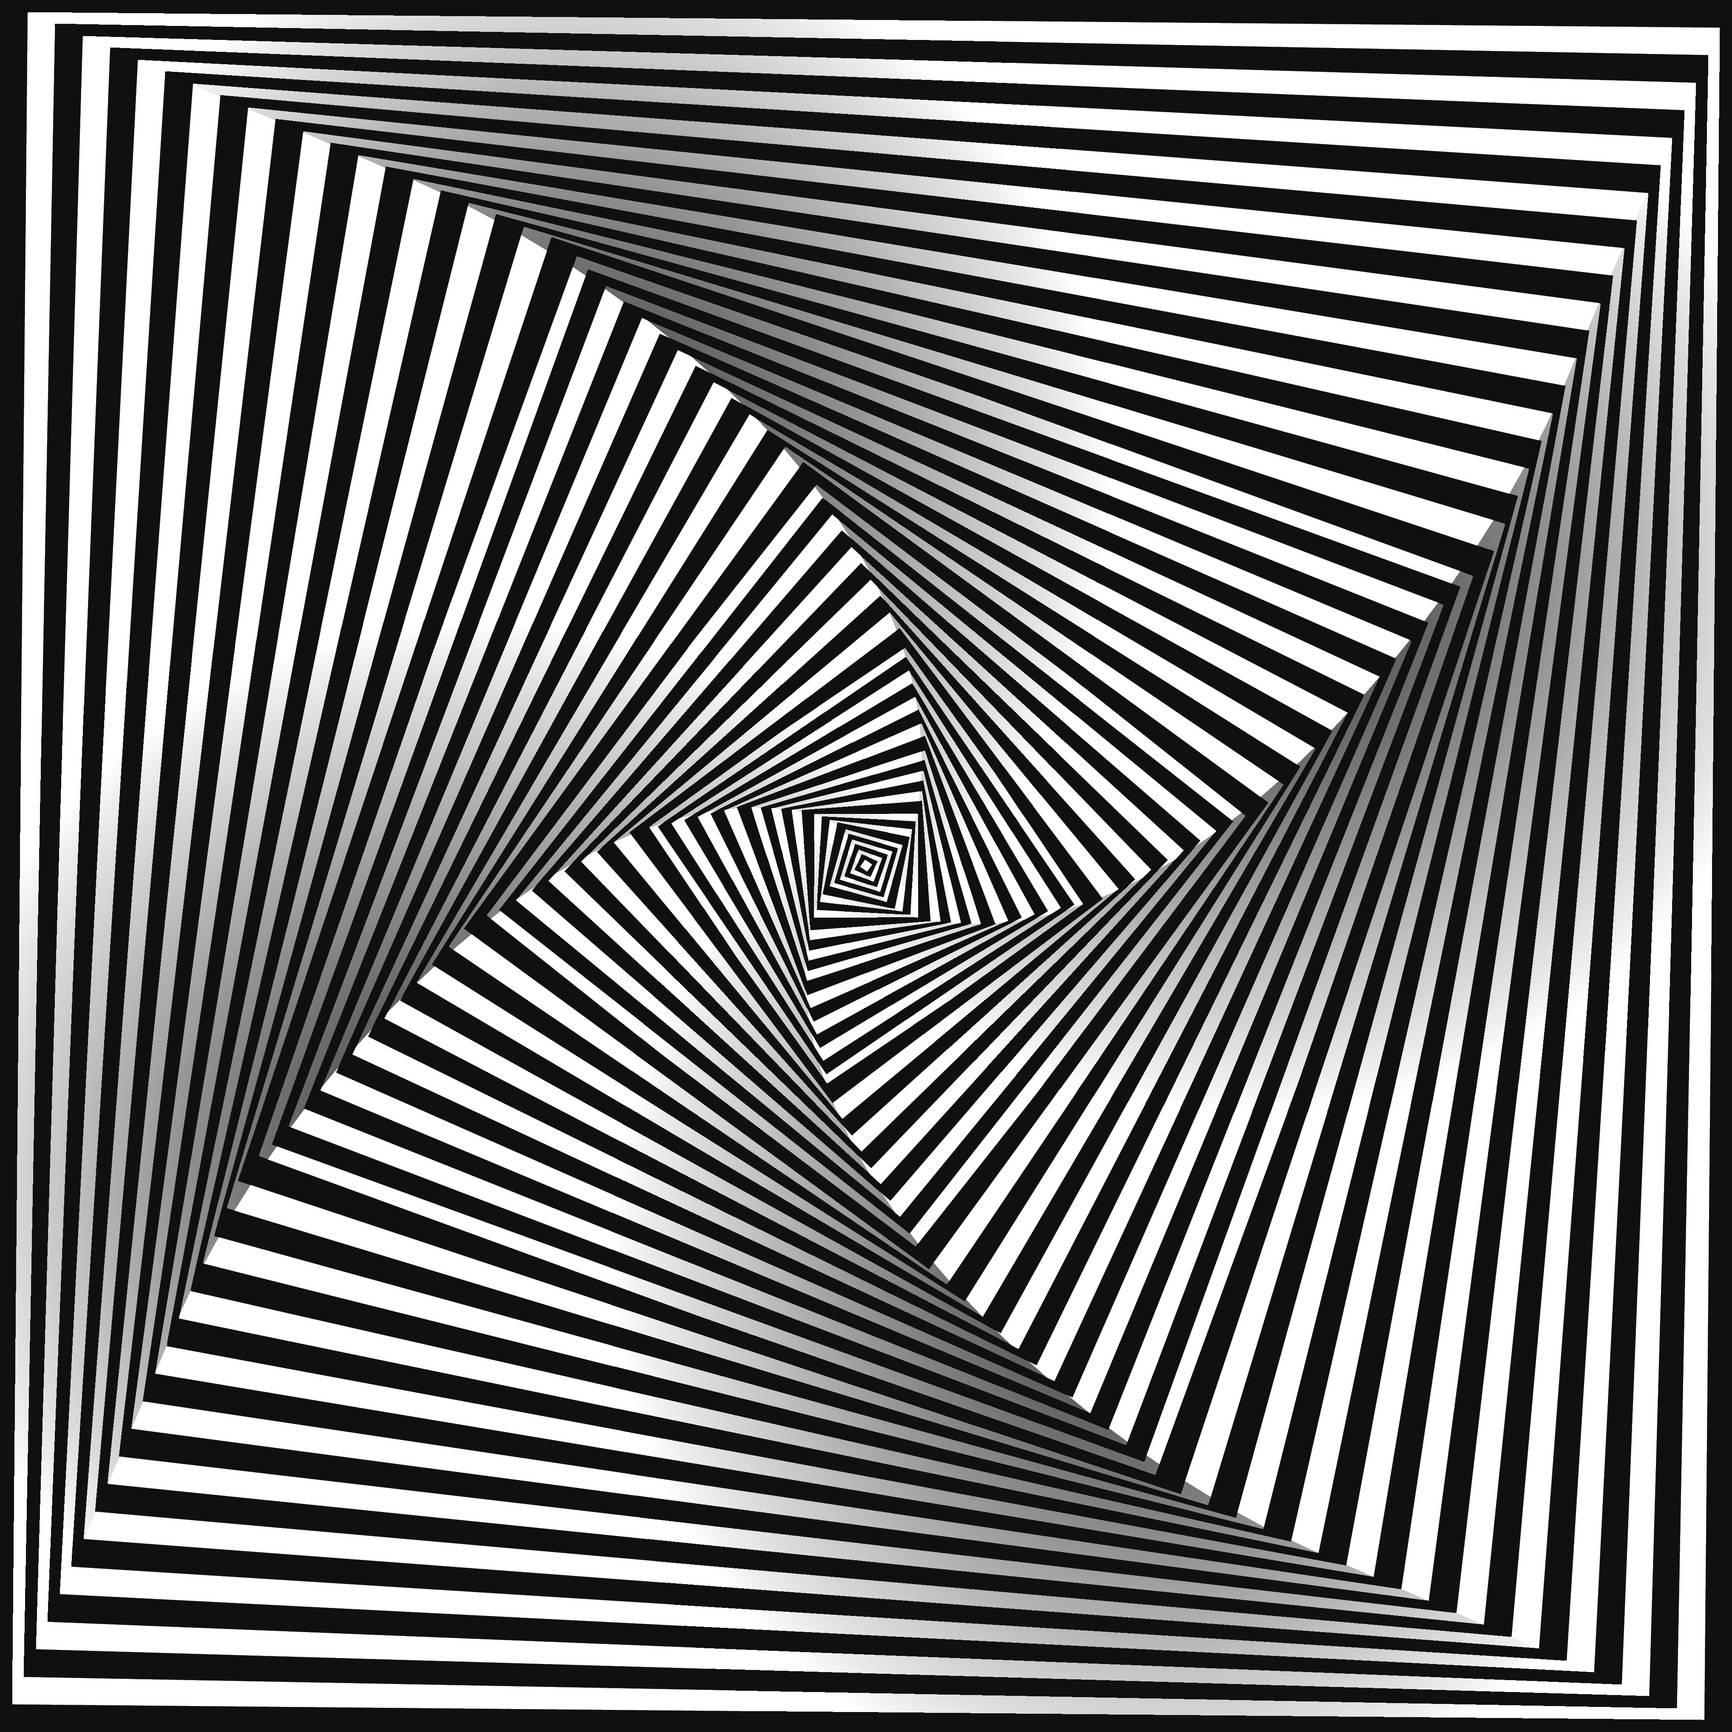 Optical Illusions Pictures - m